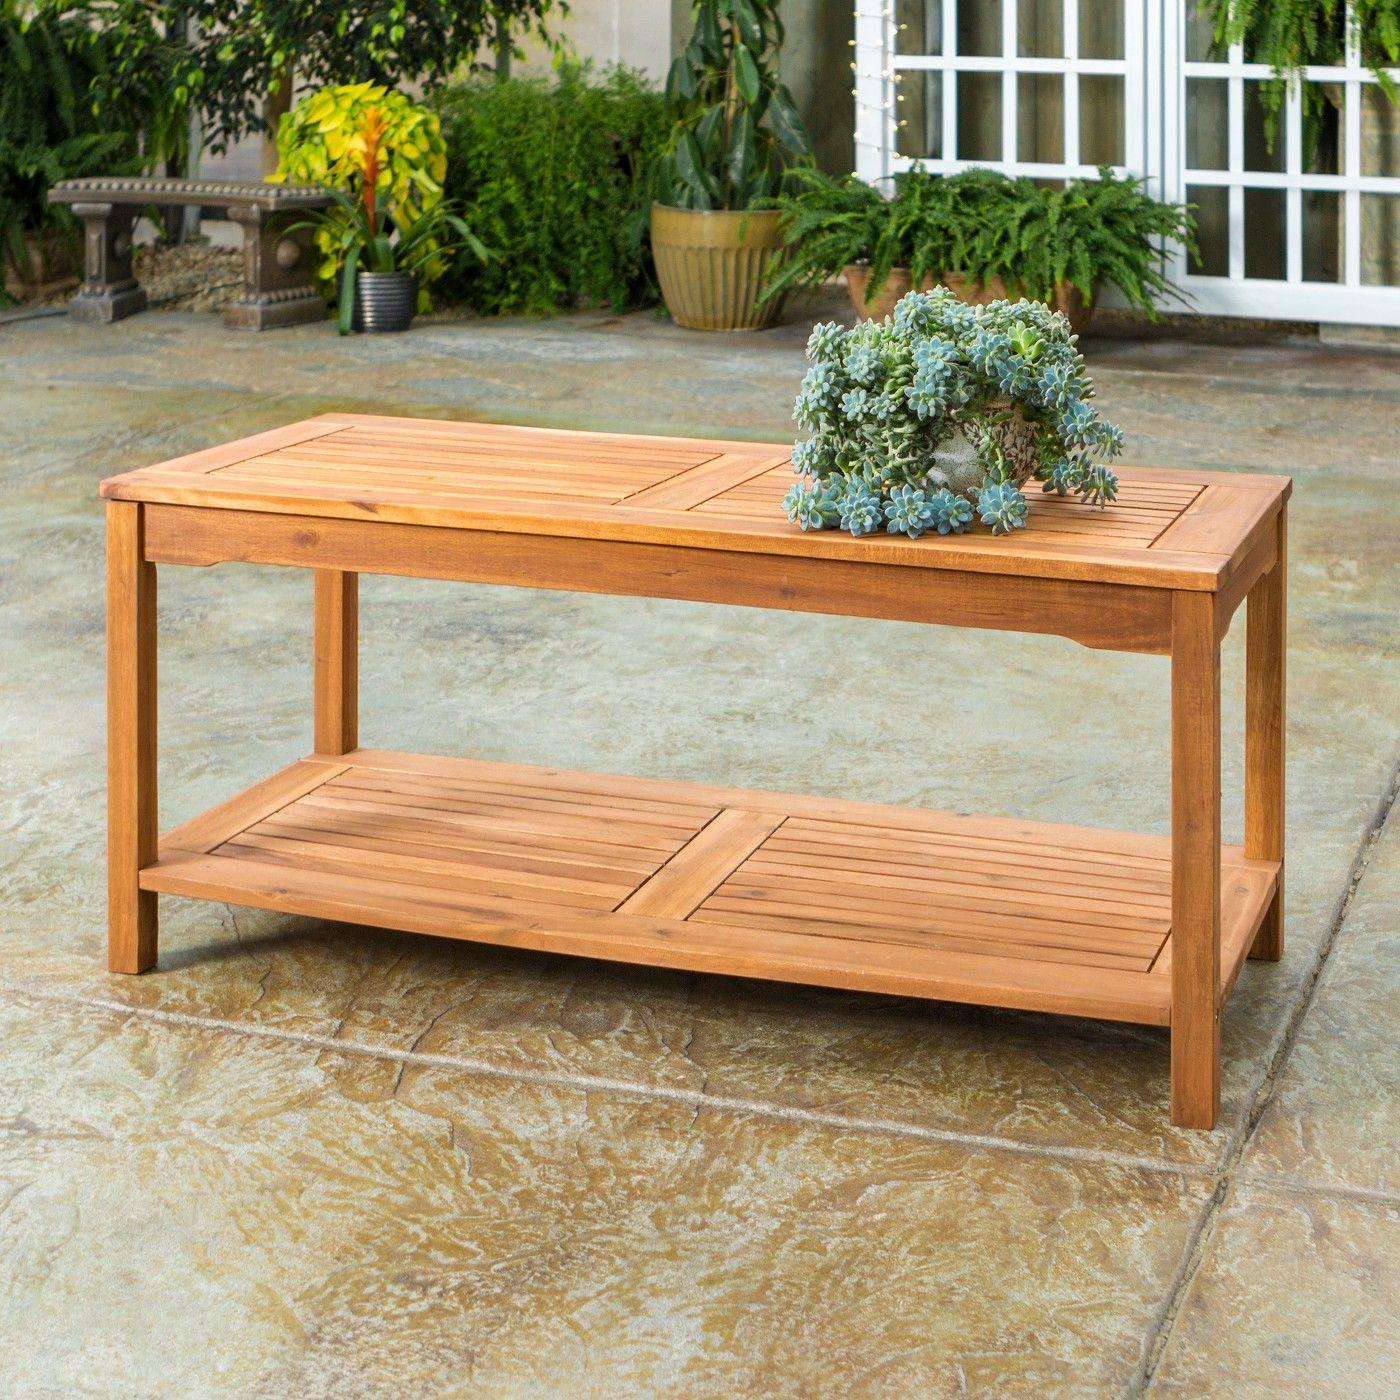 Acacia wood patio coffee table saracina home image 3